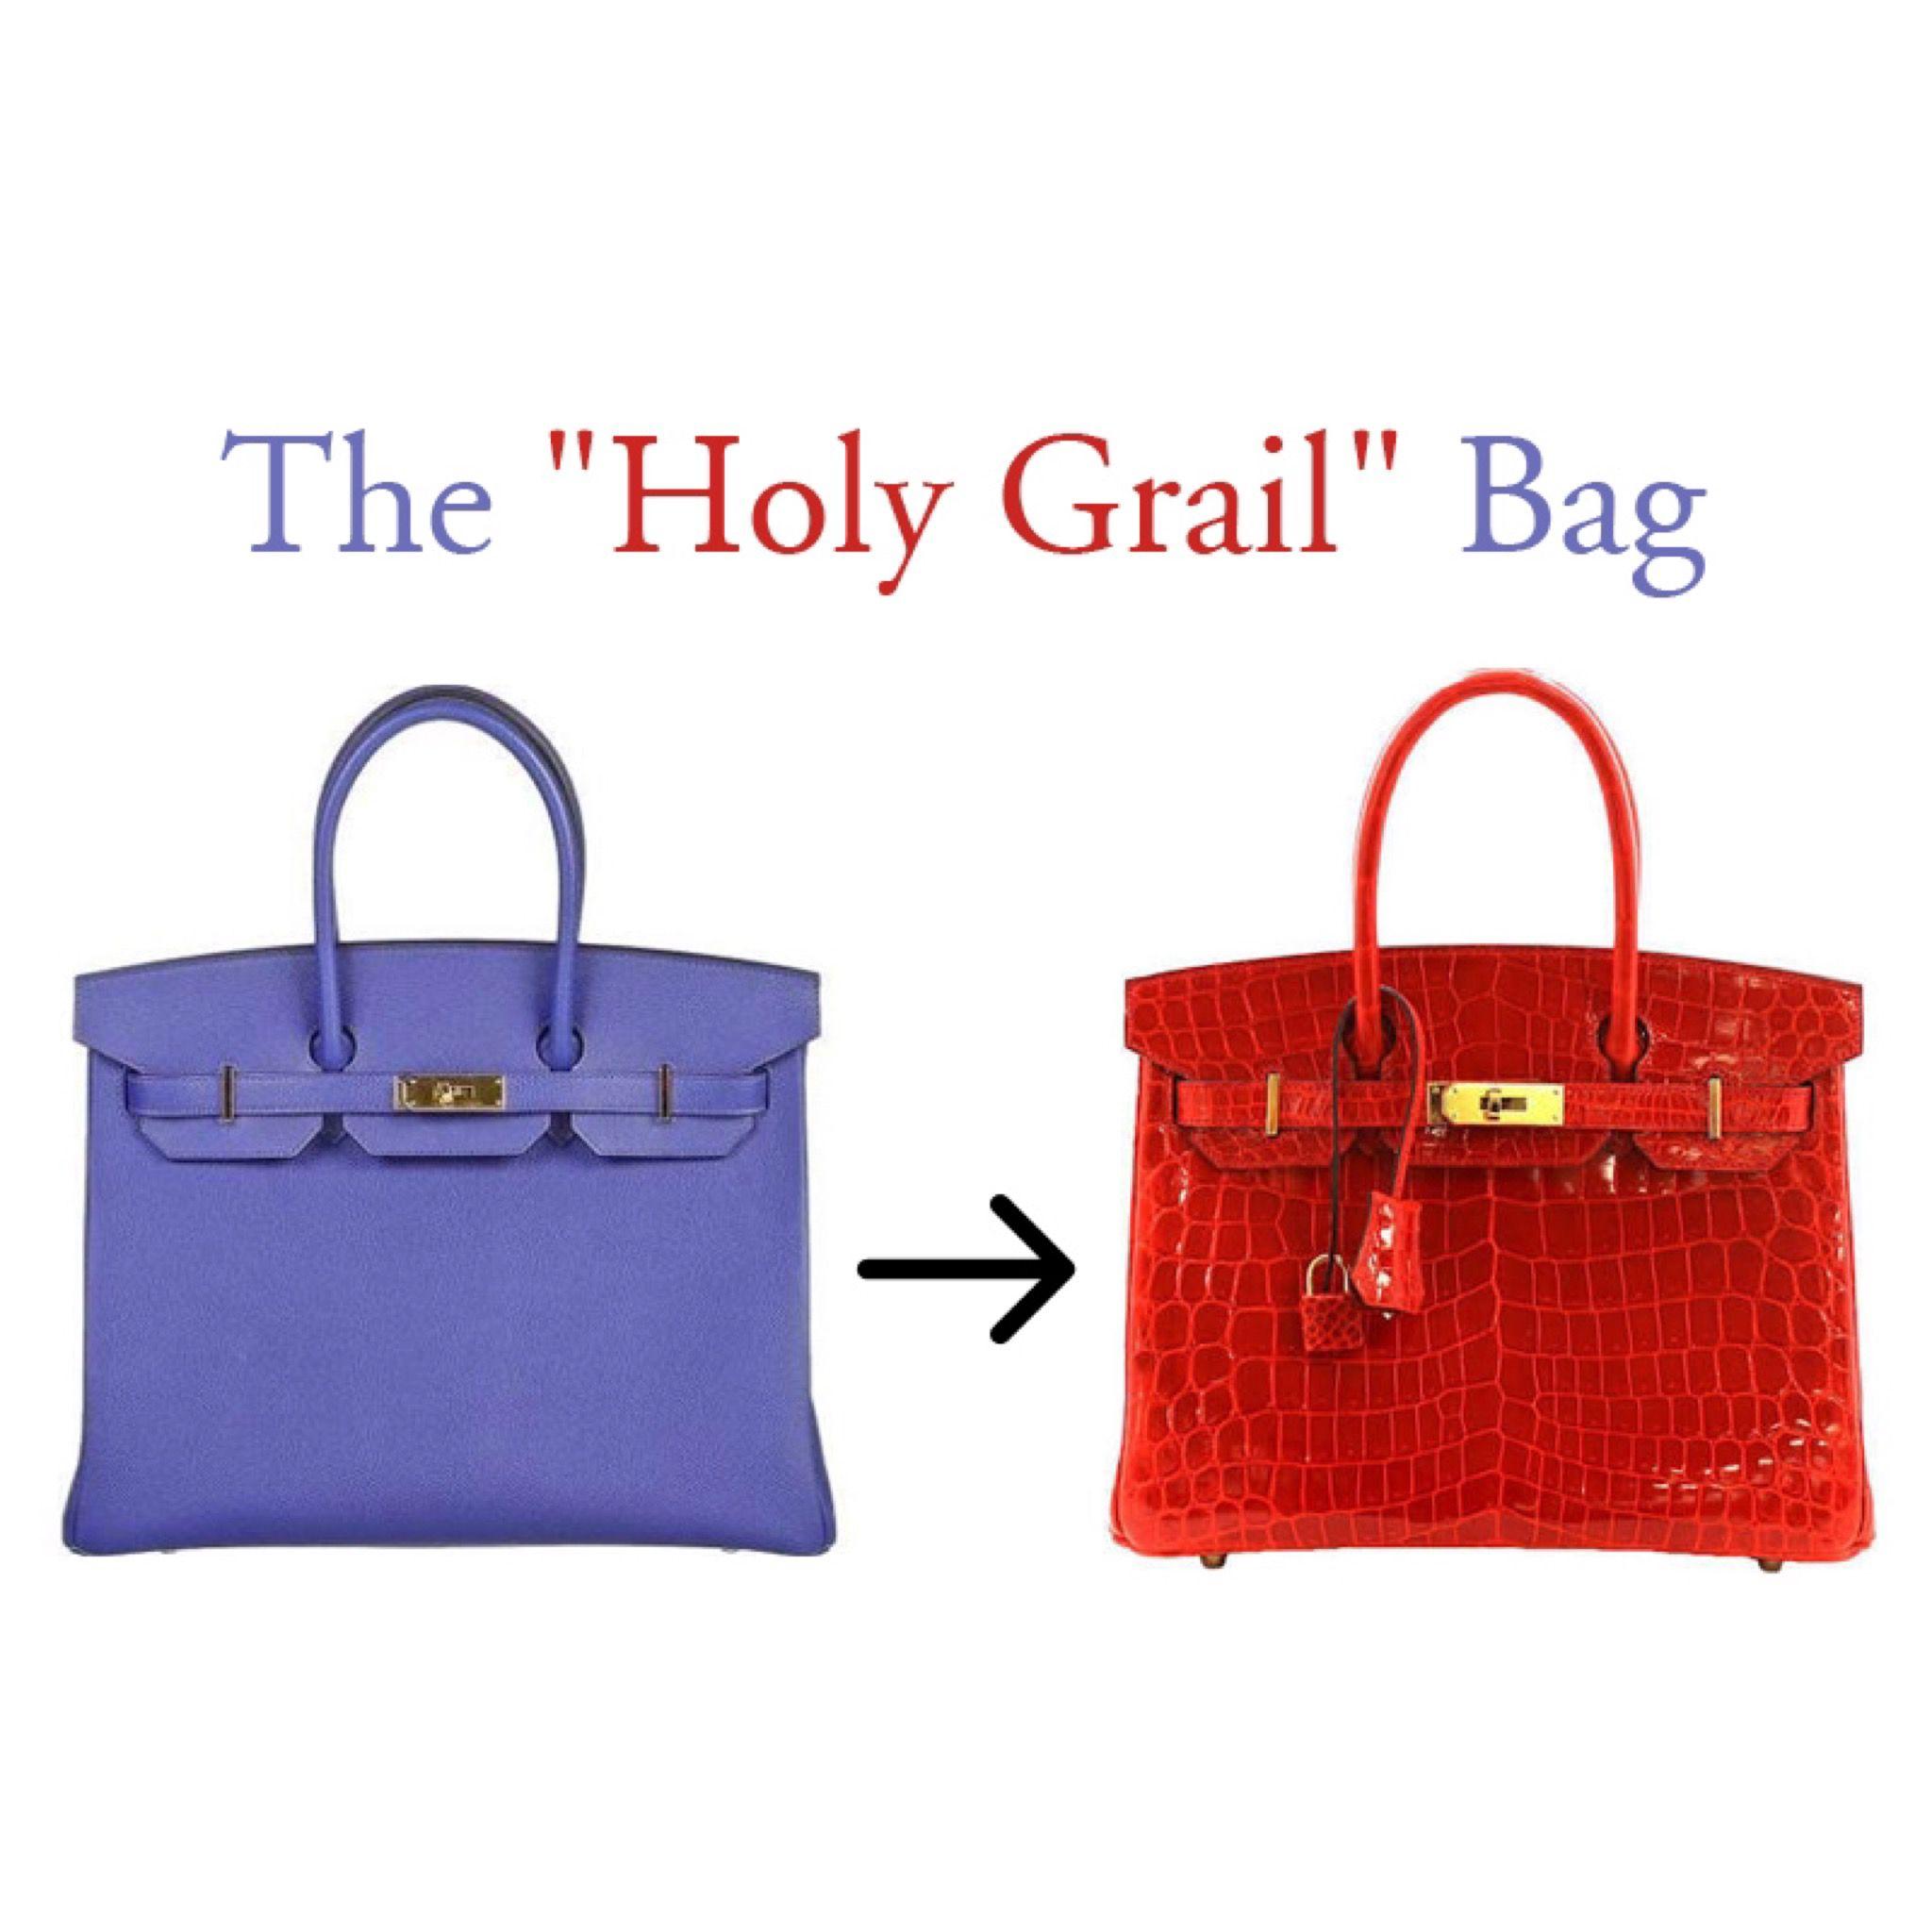 6731d45f0c1 The Hermes Birkin - The Ultimate Holy Grail Bag - PurseBop